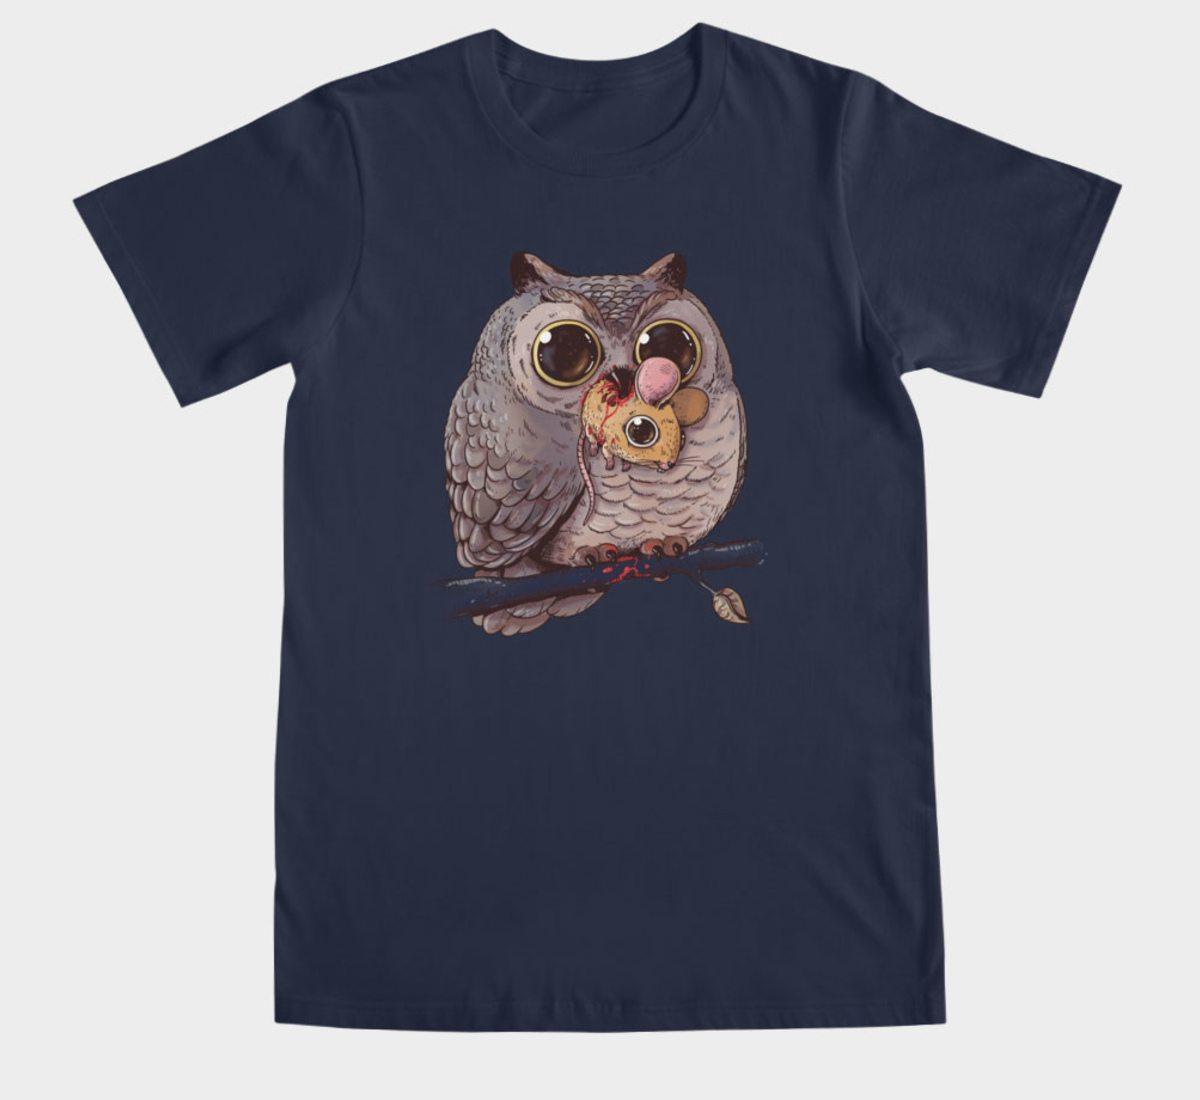 shirt_guys_01oowl